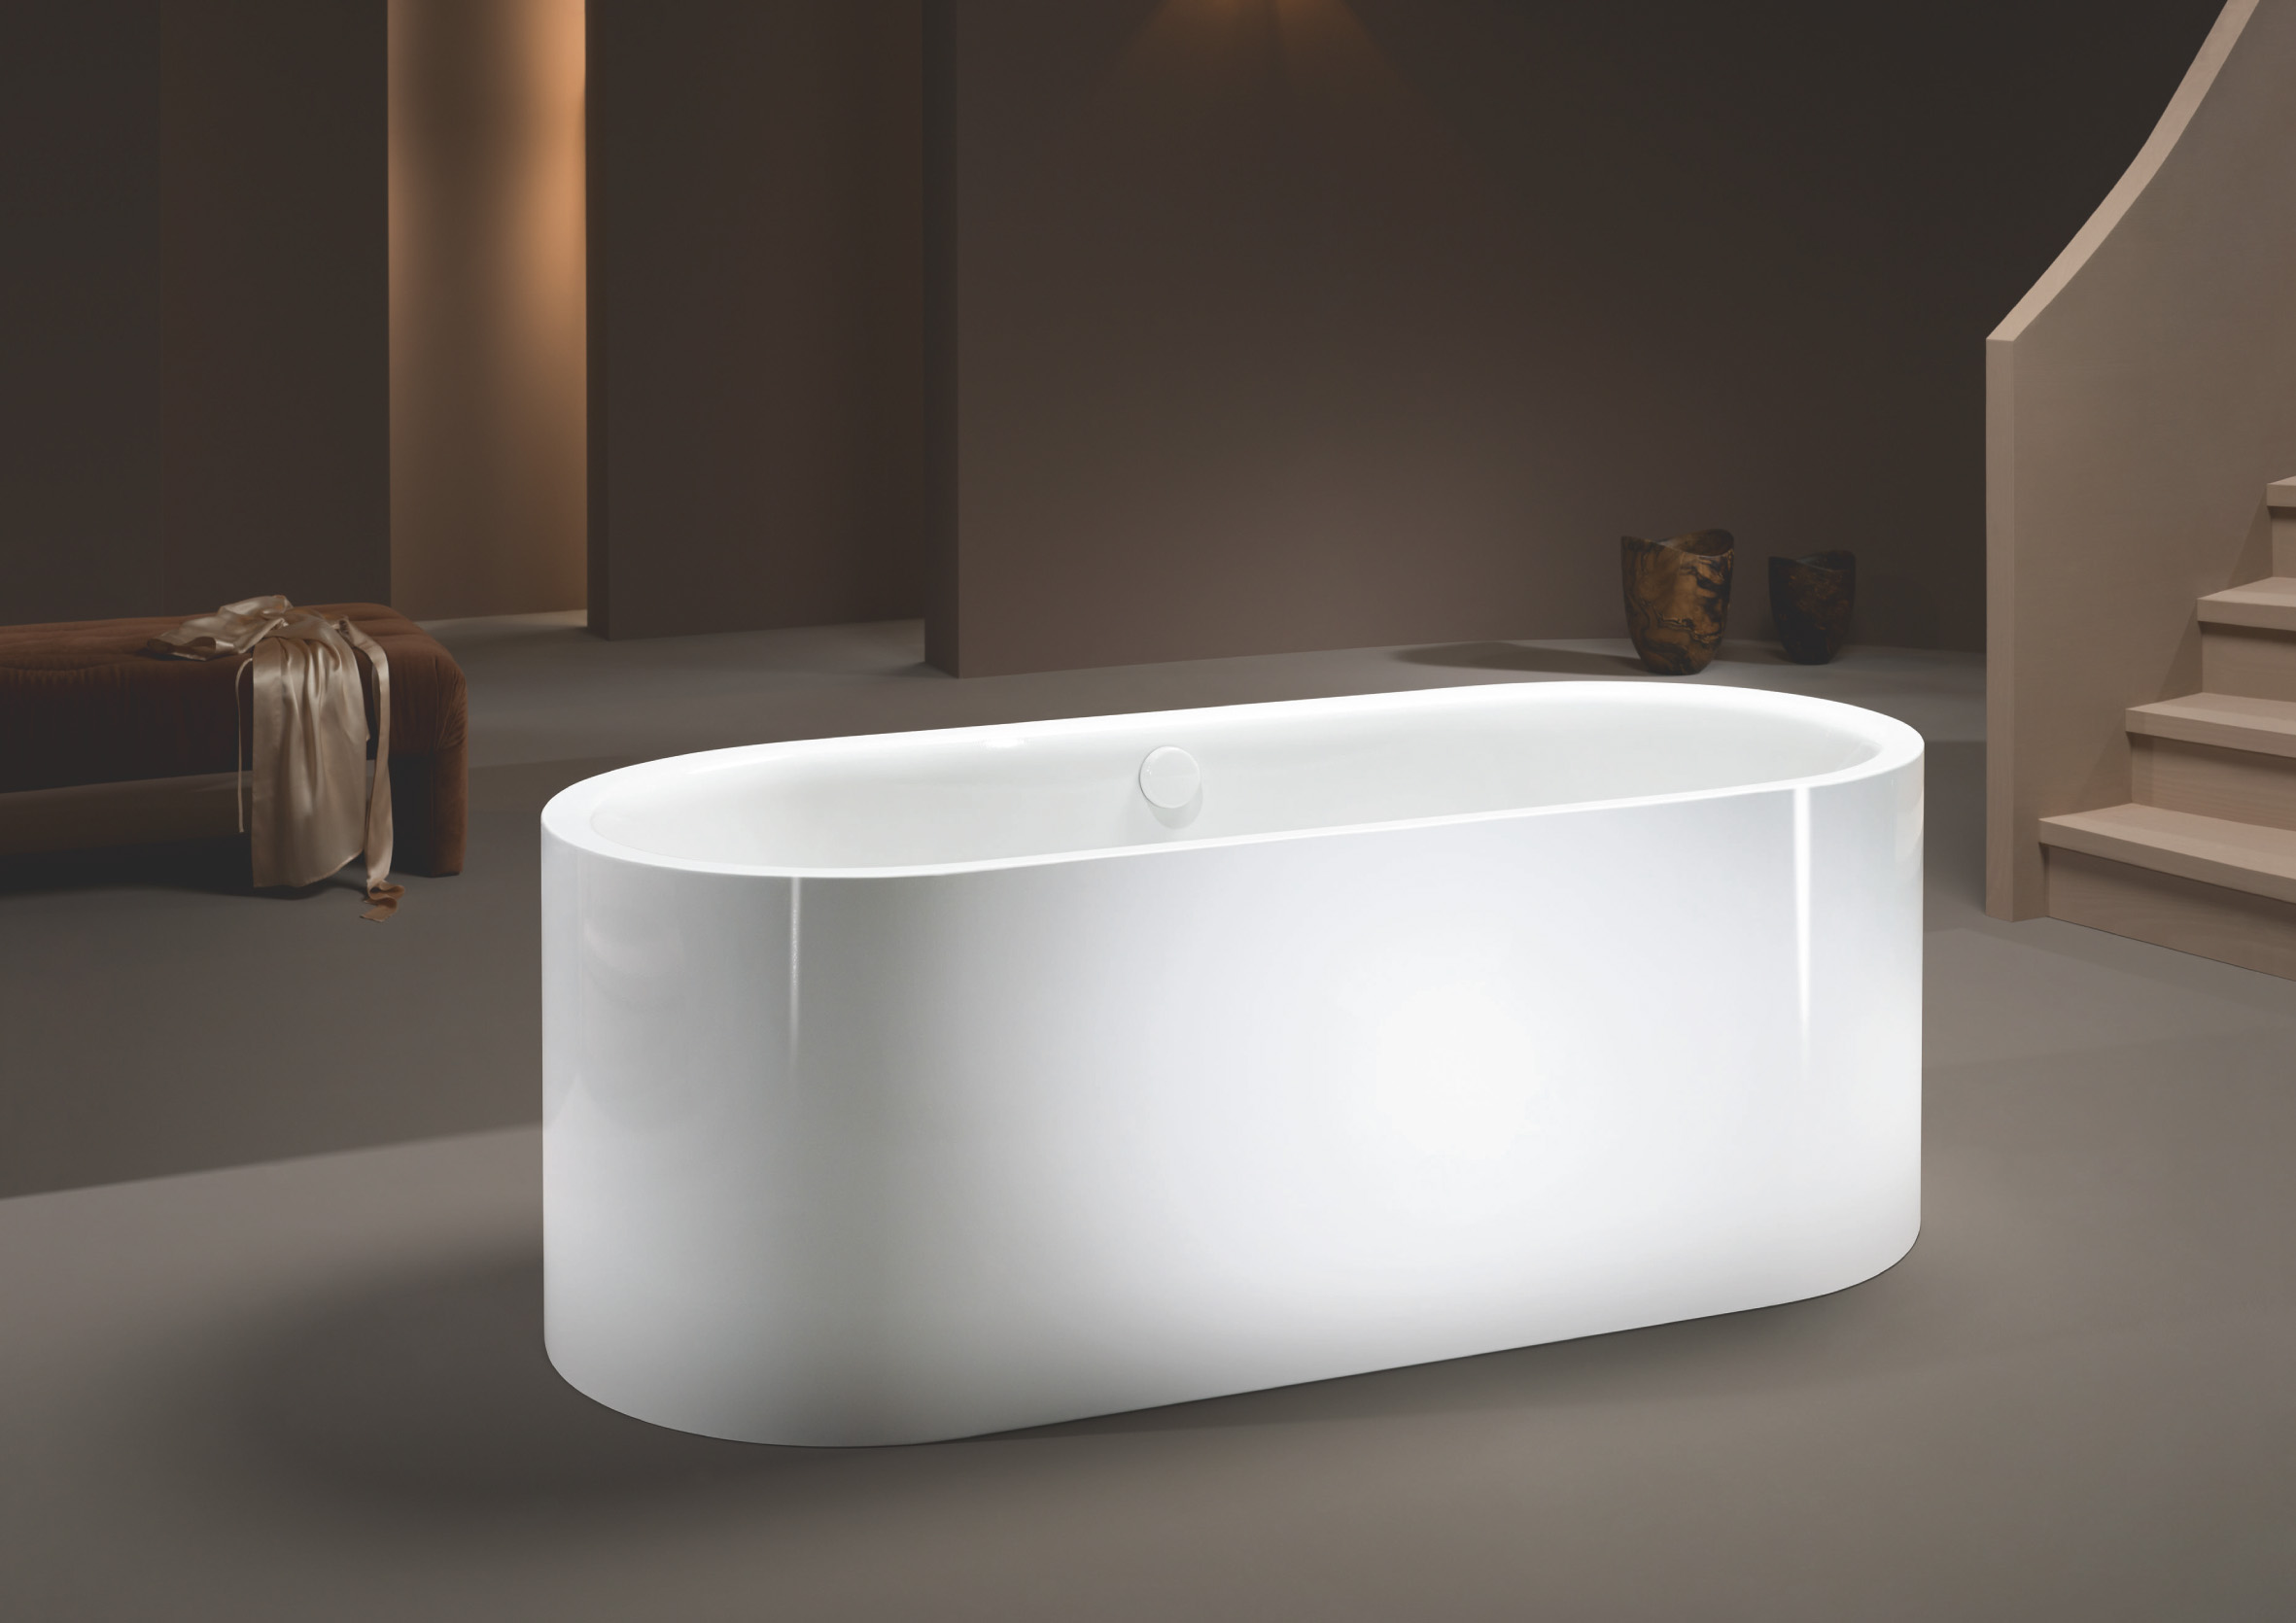 kaldewei presents new masterpieces premium range the kitchen and bathroom blog. Black Bedroom Furniture Sets. Home Design Ideas